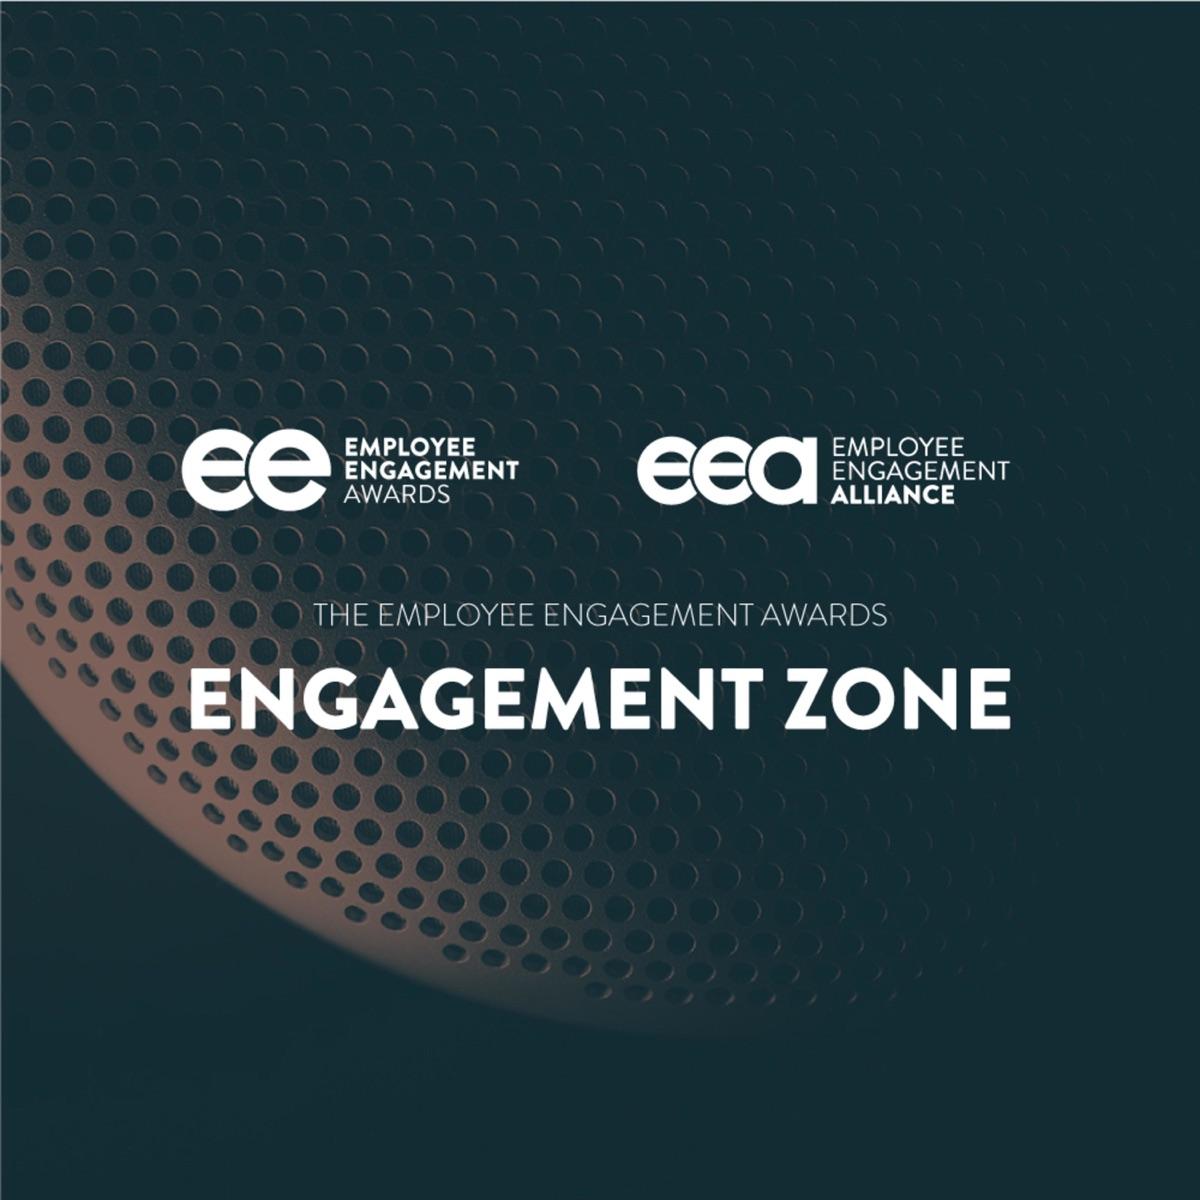 Engagement Zone